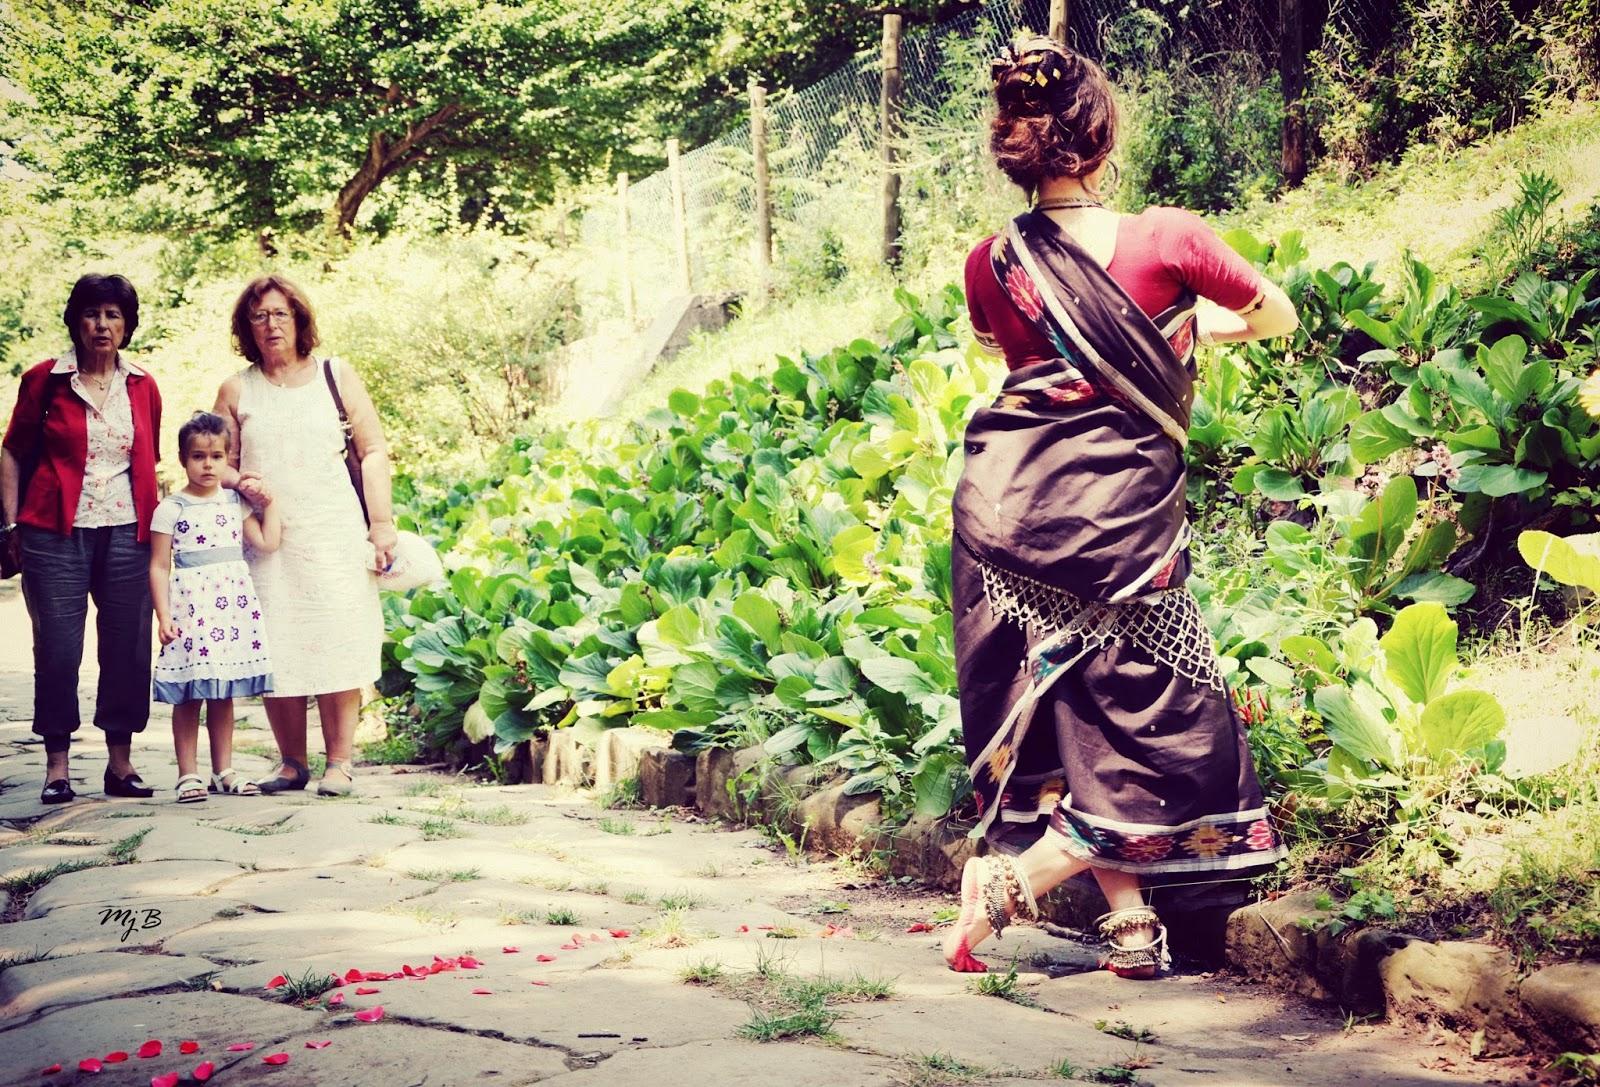 danza sacra indiana